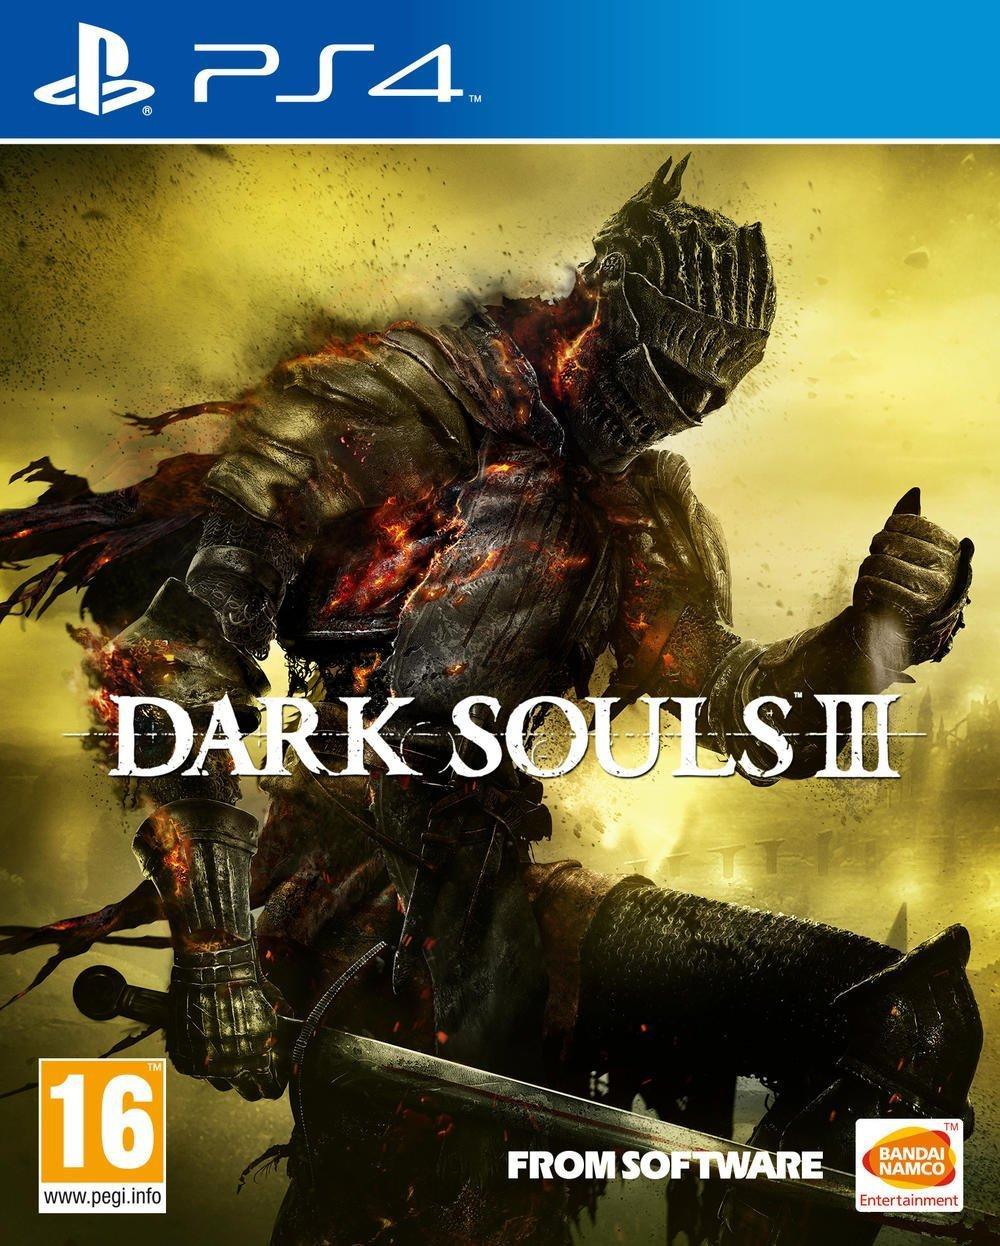 Dark Souls 3 sur PS4